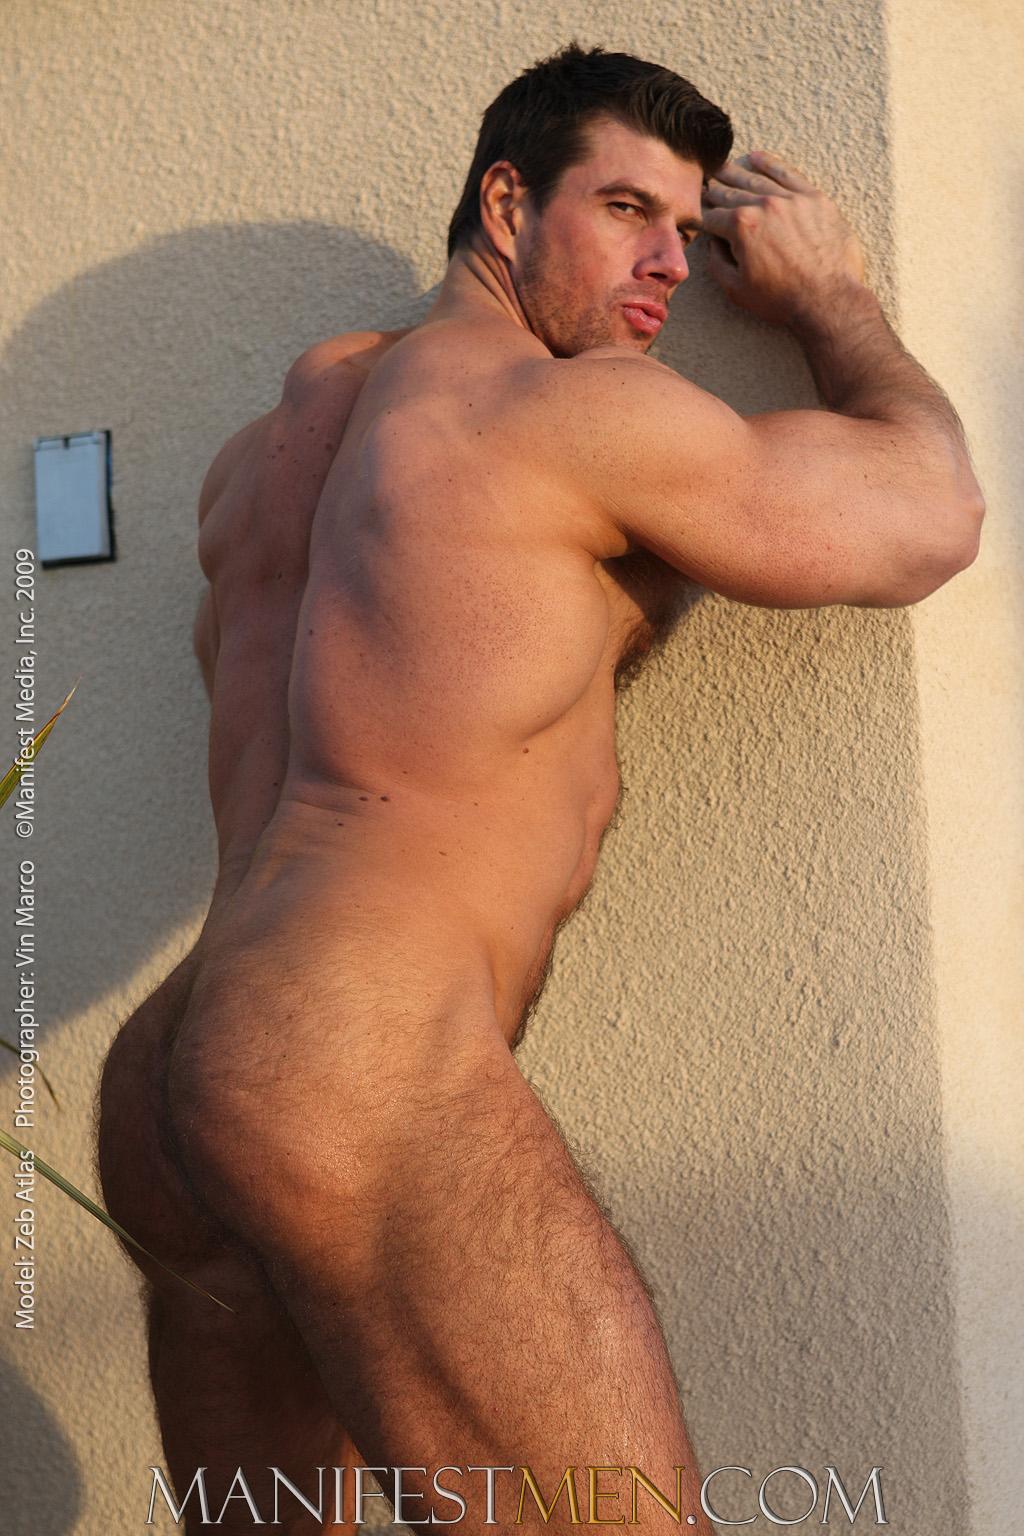 Understood Zeb atlas nude cute pics cheaply